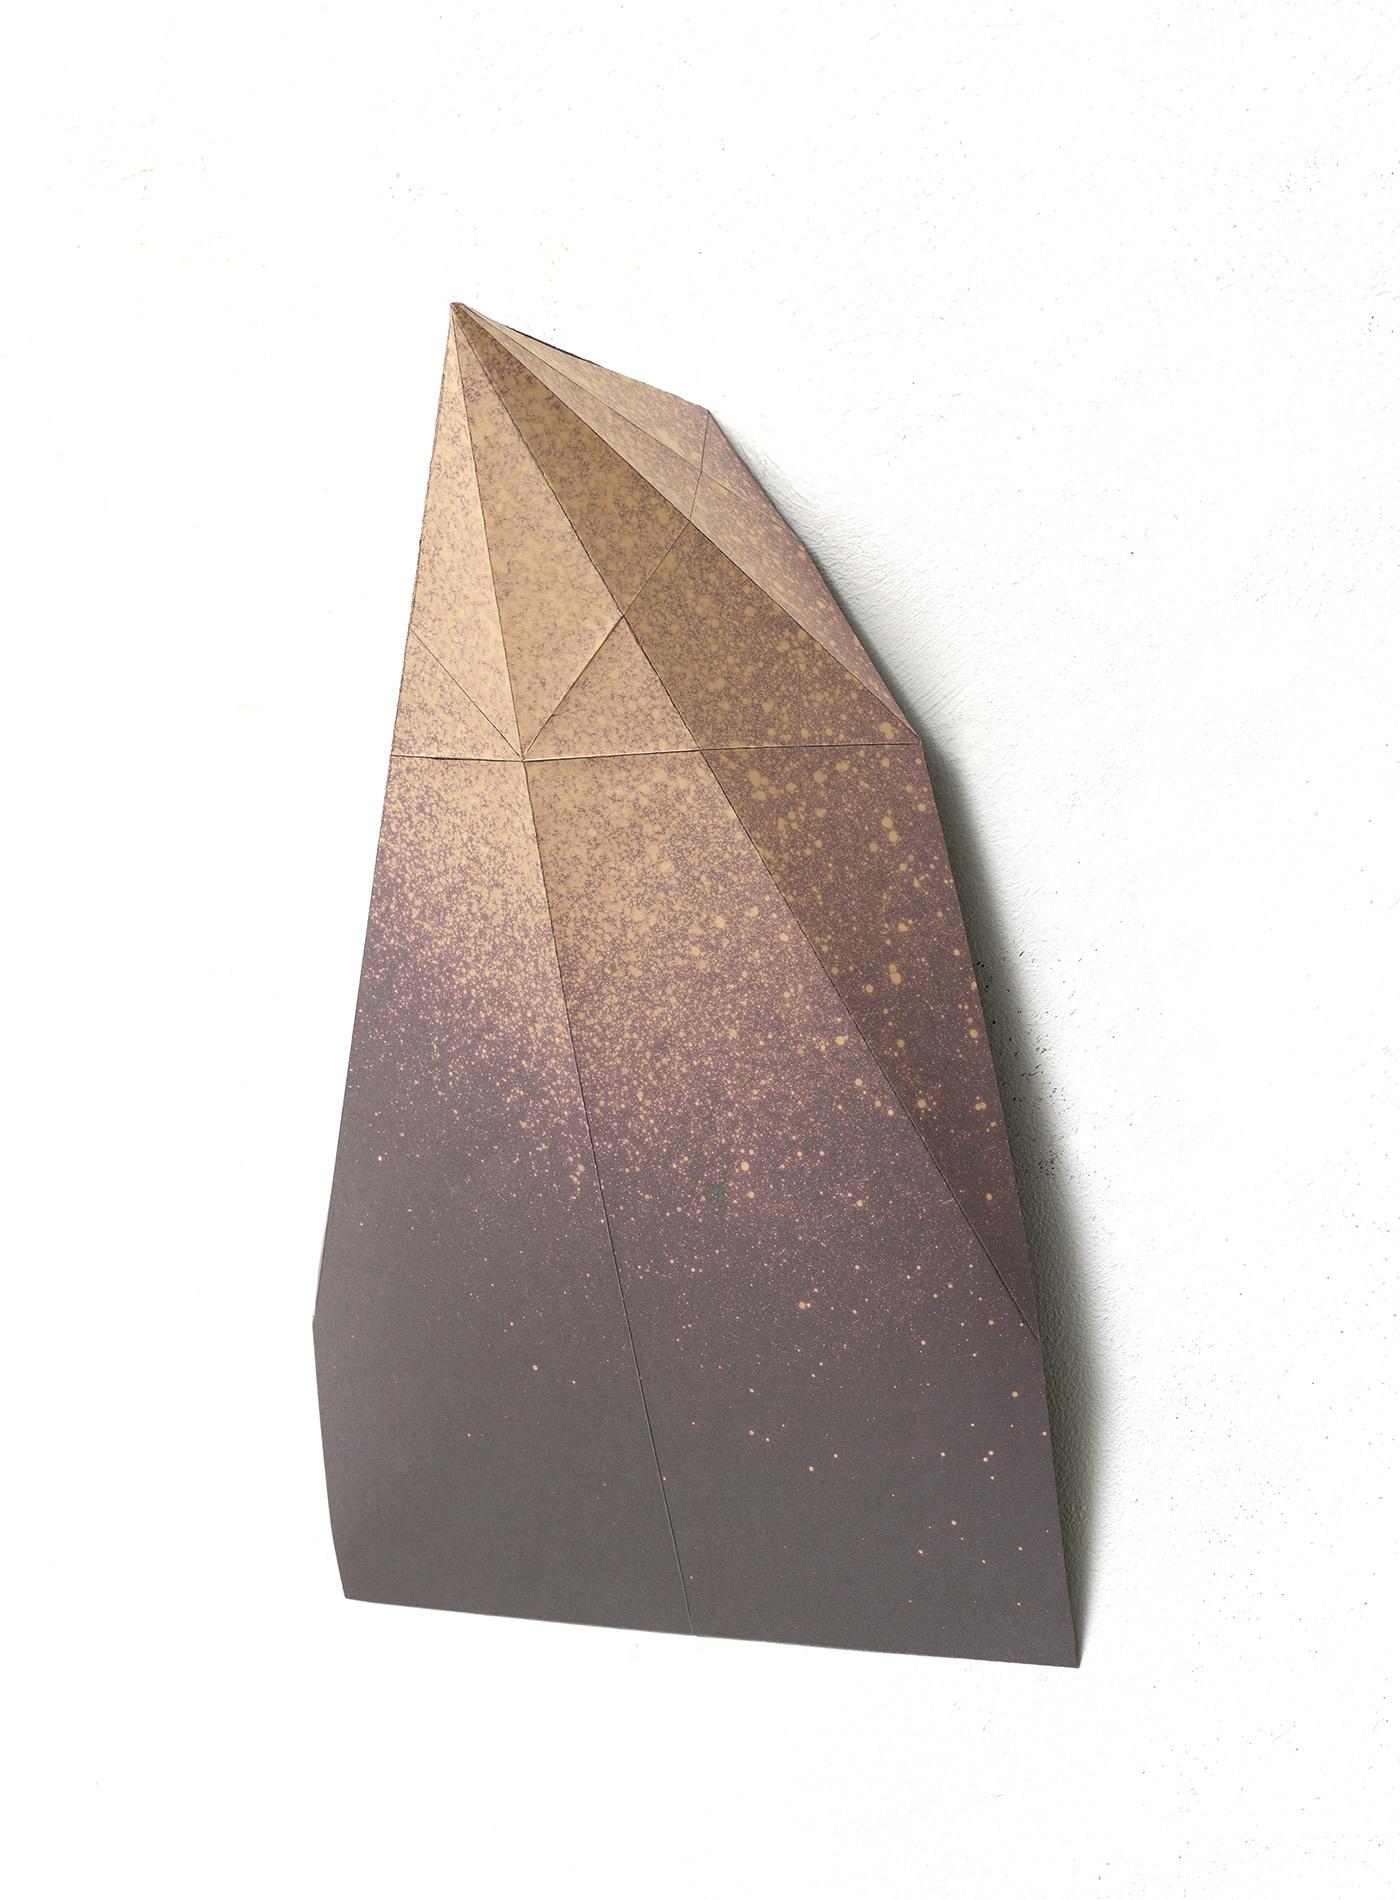 Origami-Volator-Angelika-J-Trojnarski-b